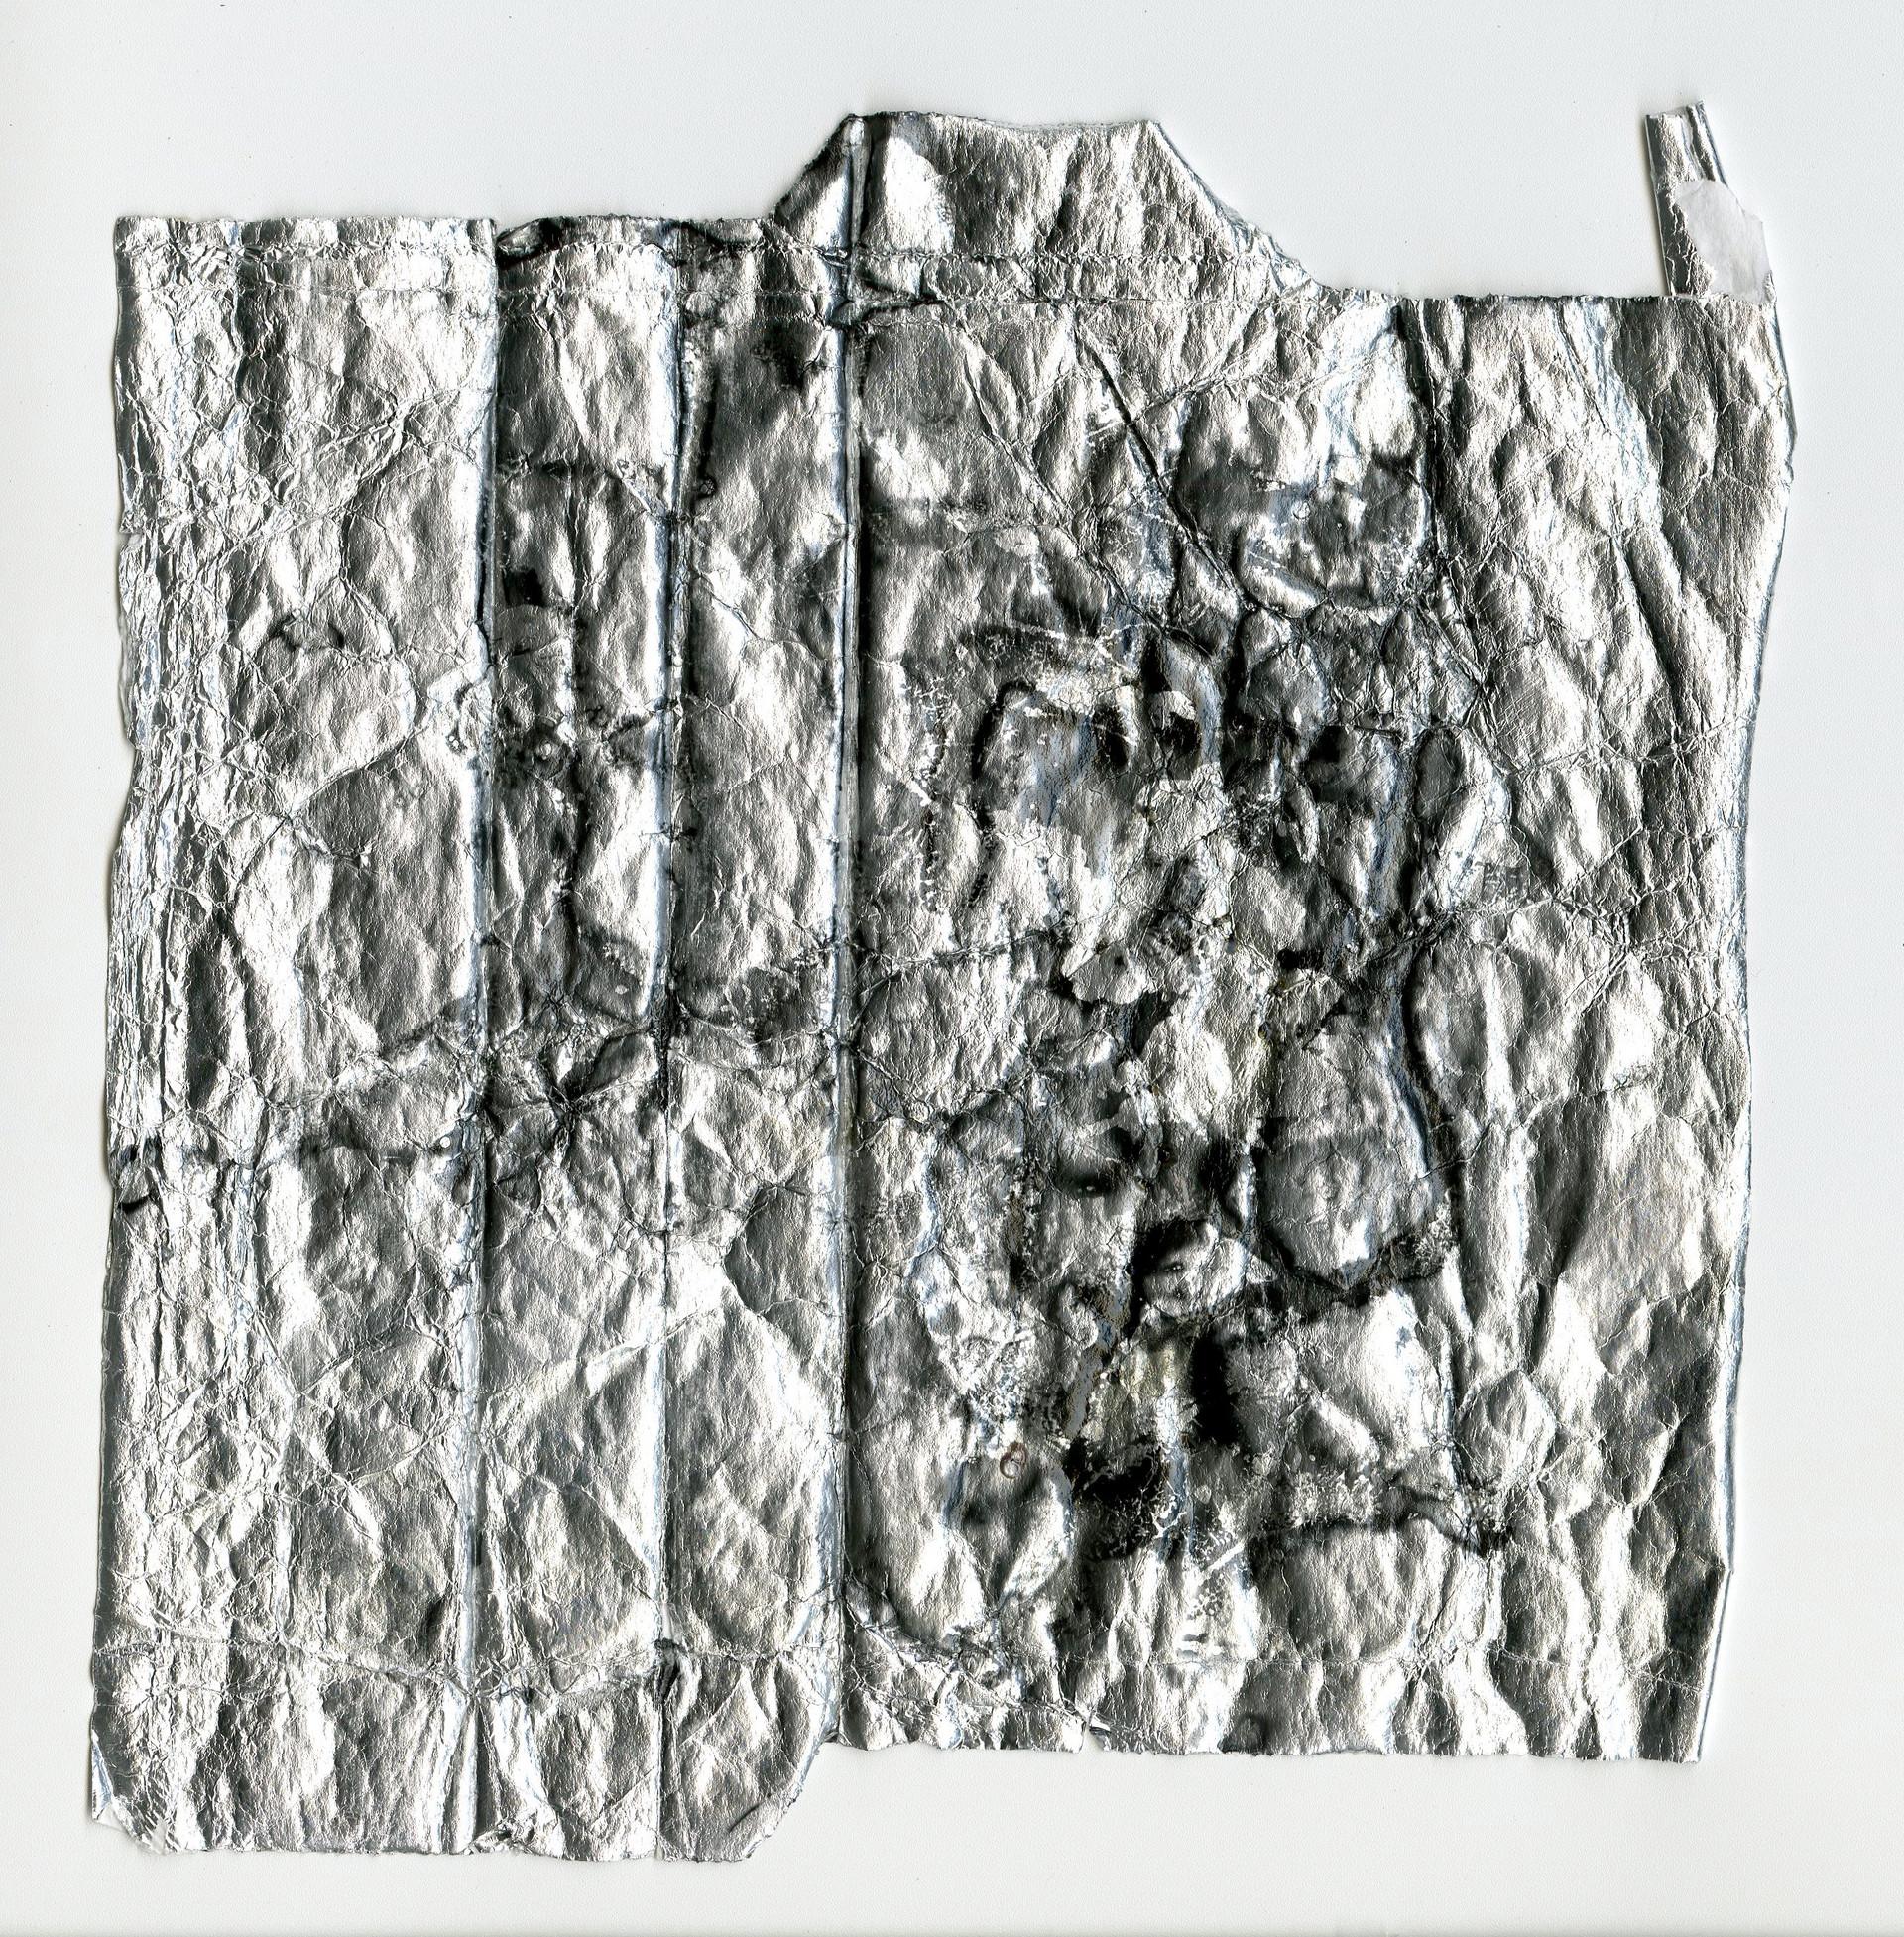 Imprint 16